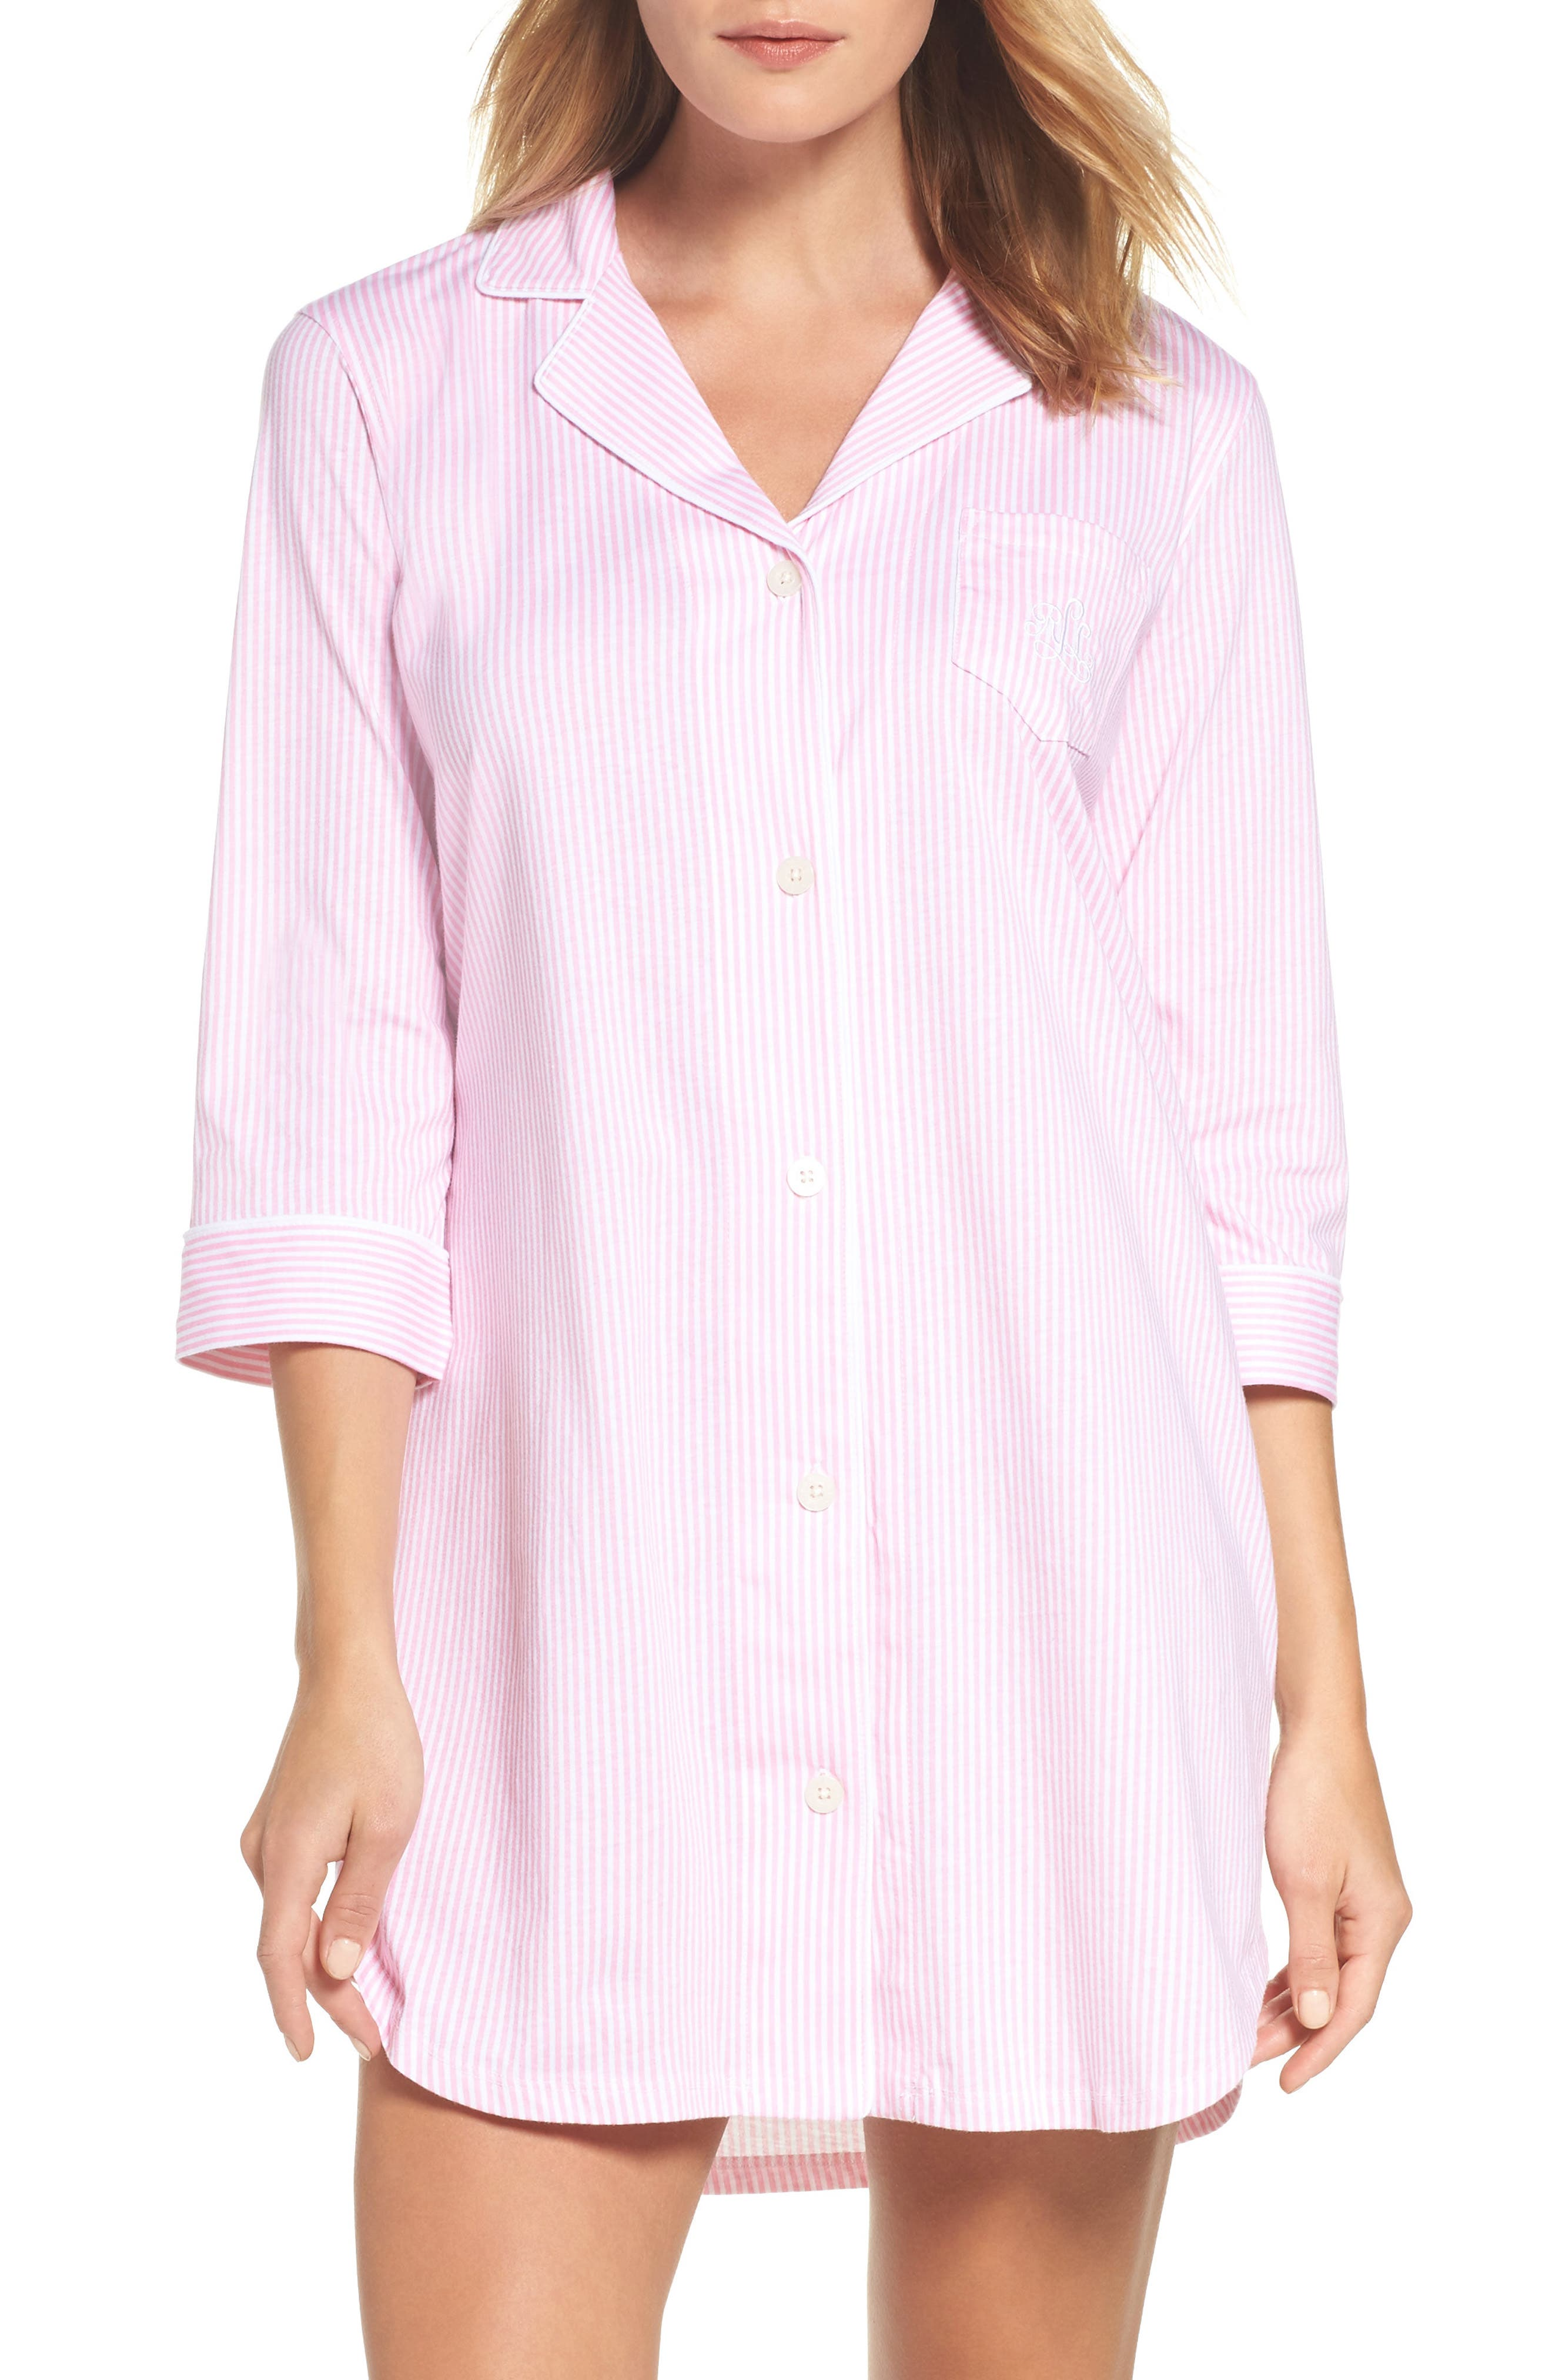 Lauren Ralph Lauren Cotton Jersey Sleep Shirt, Pink (Online Only)